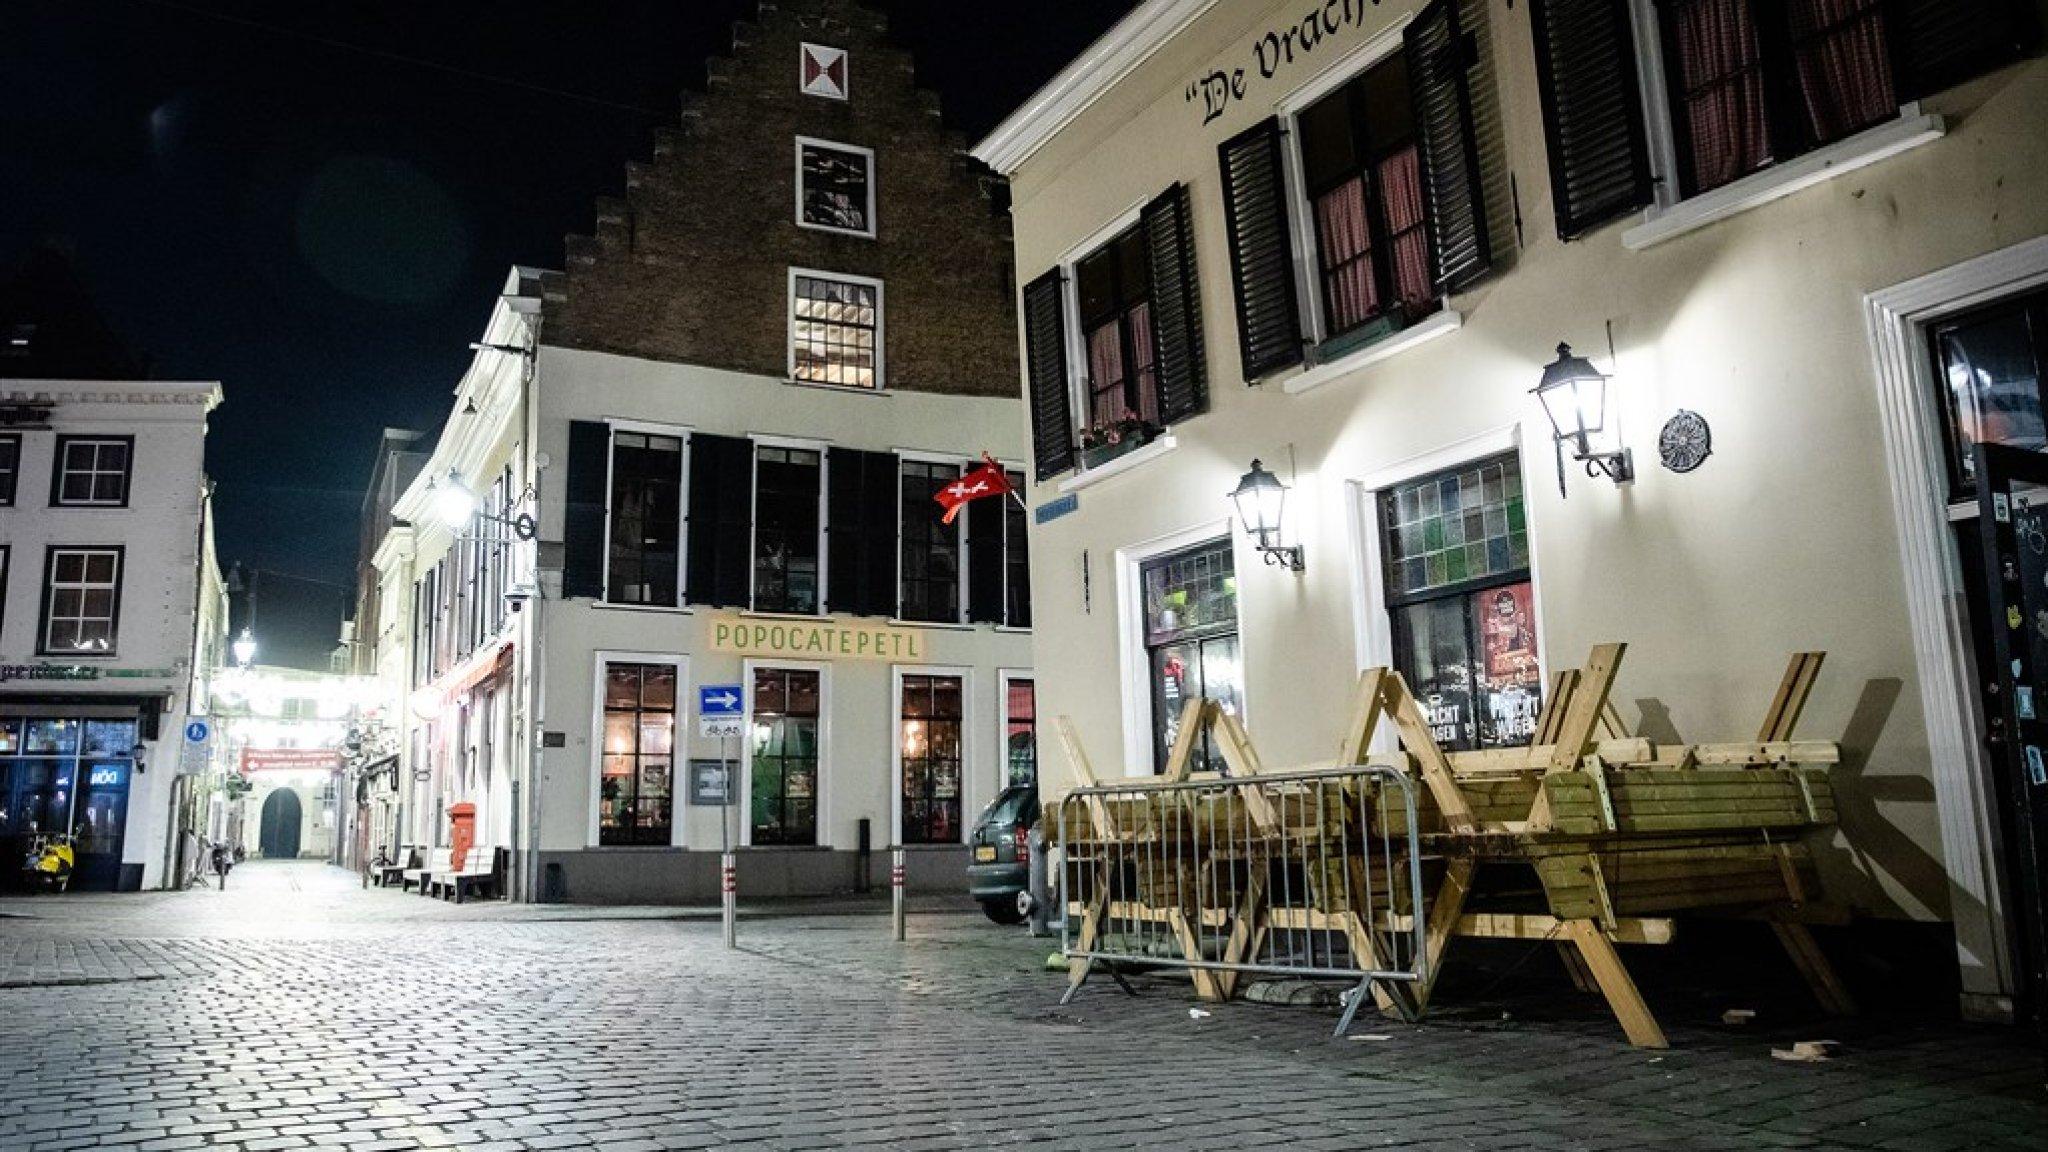 (c) Rtlnieuws.nl